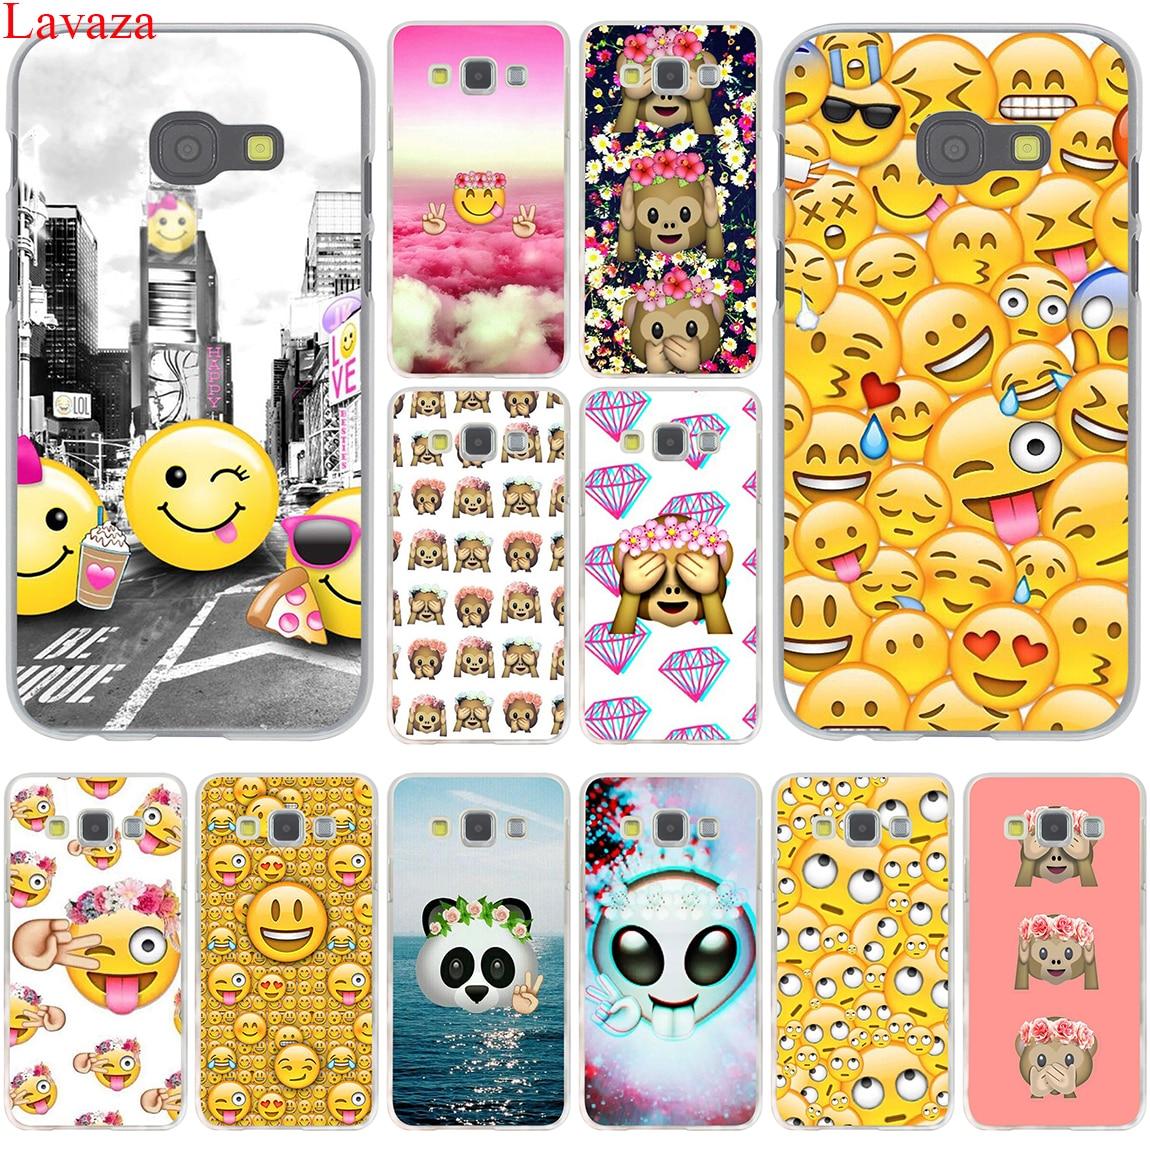 Lavaza smile coque alien emoji happy hard case cover for for Housse samsung j3